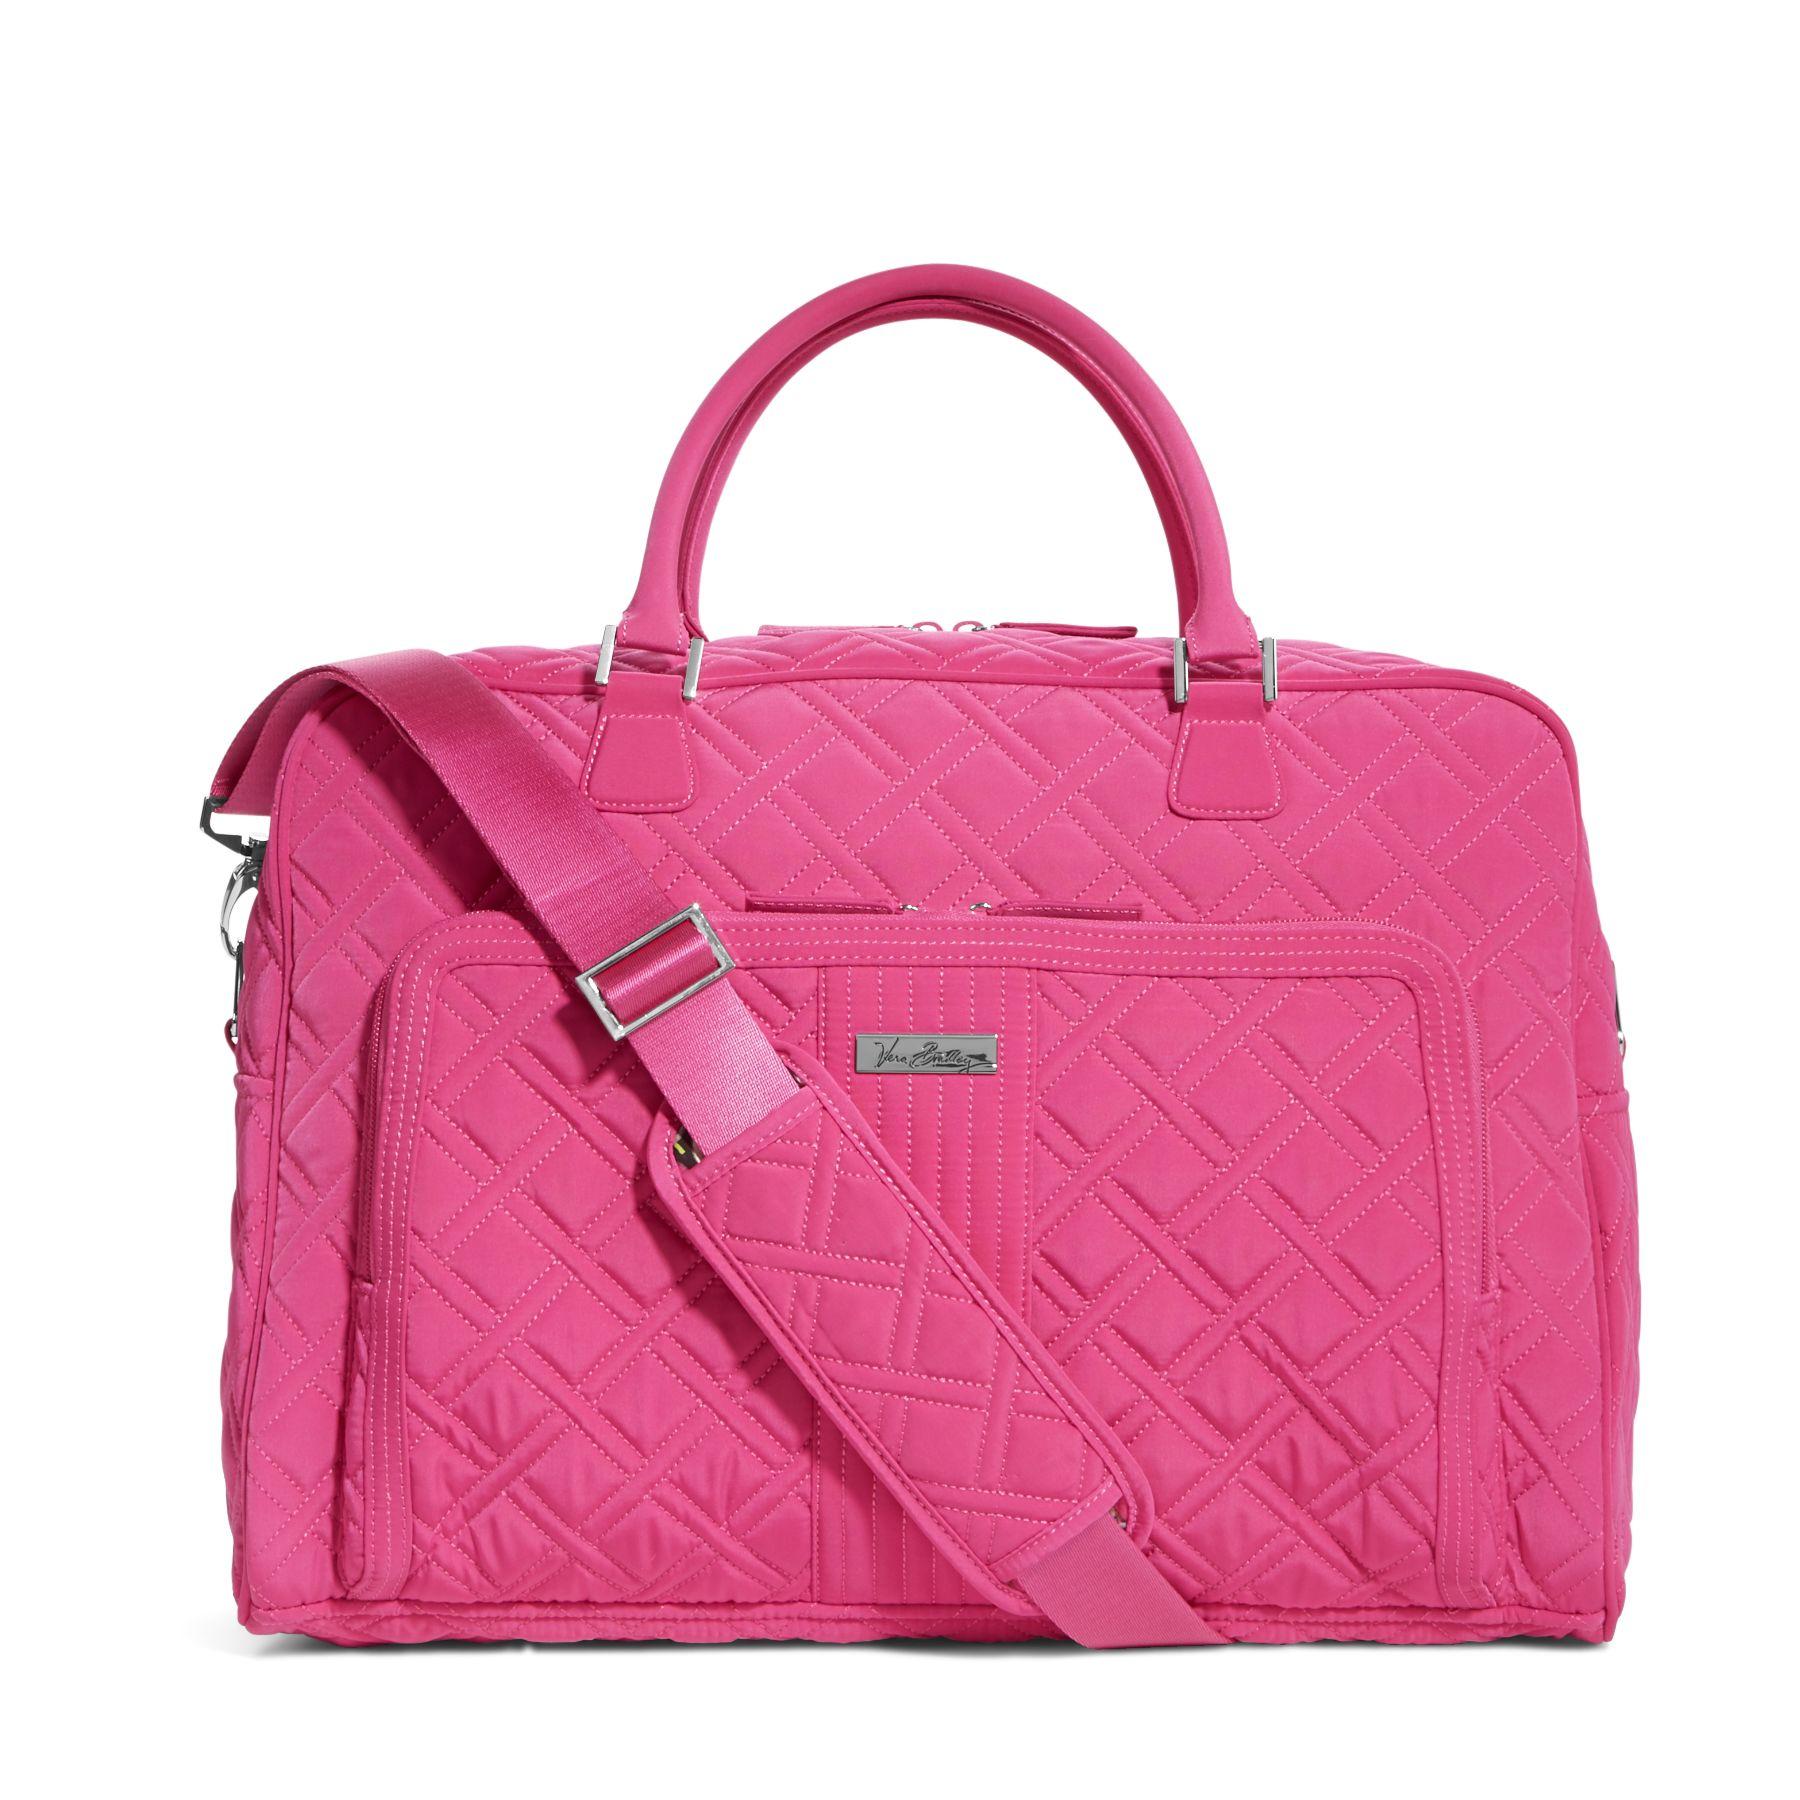 Vera Bradley Weekender Travel Bag in Fuchsia